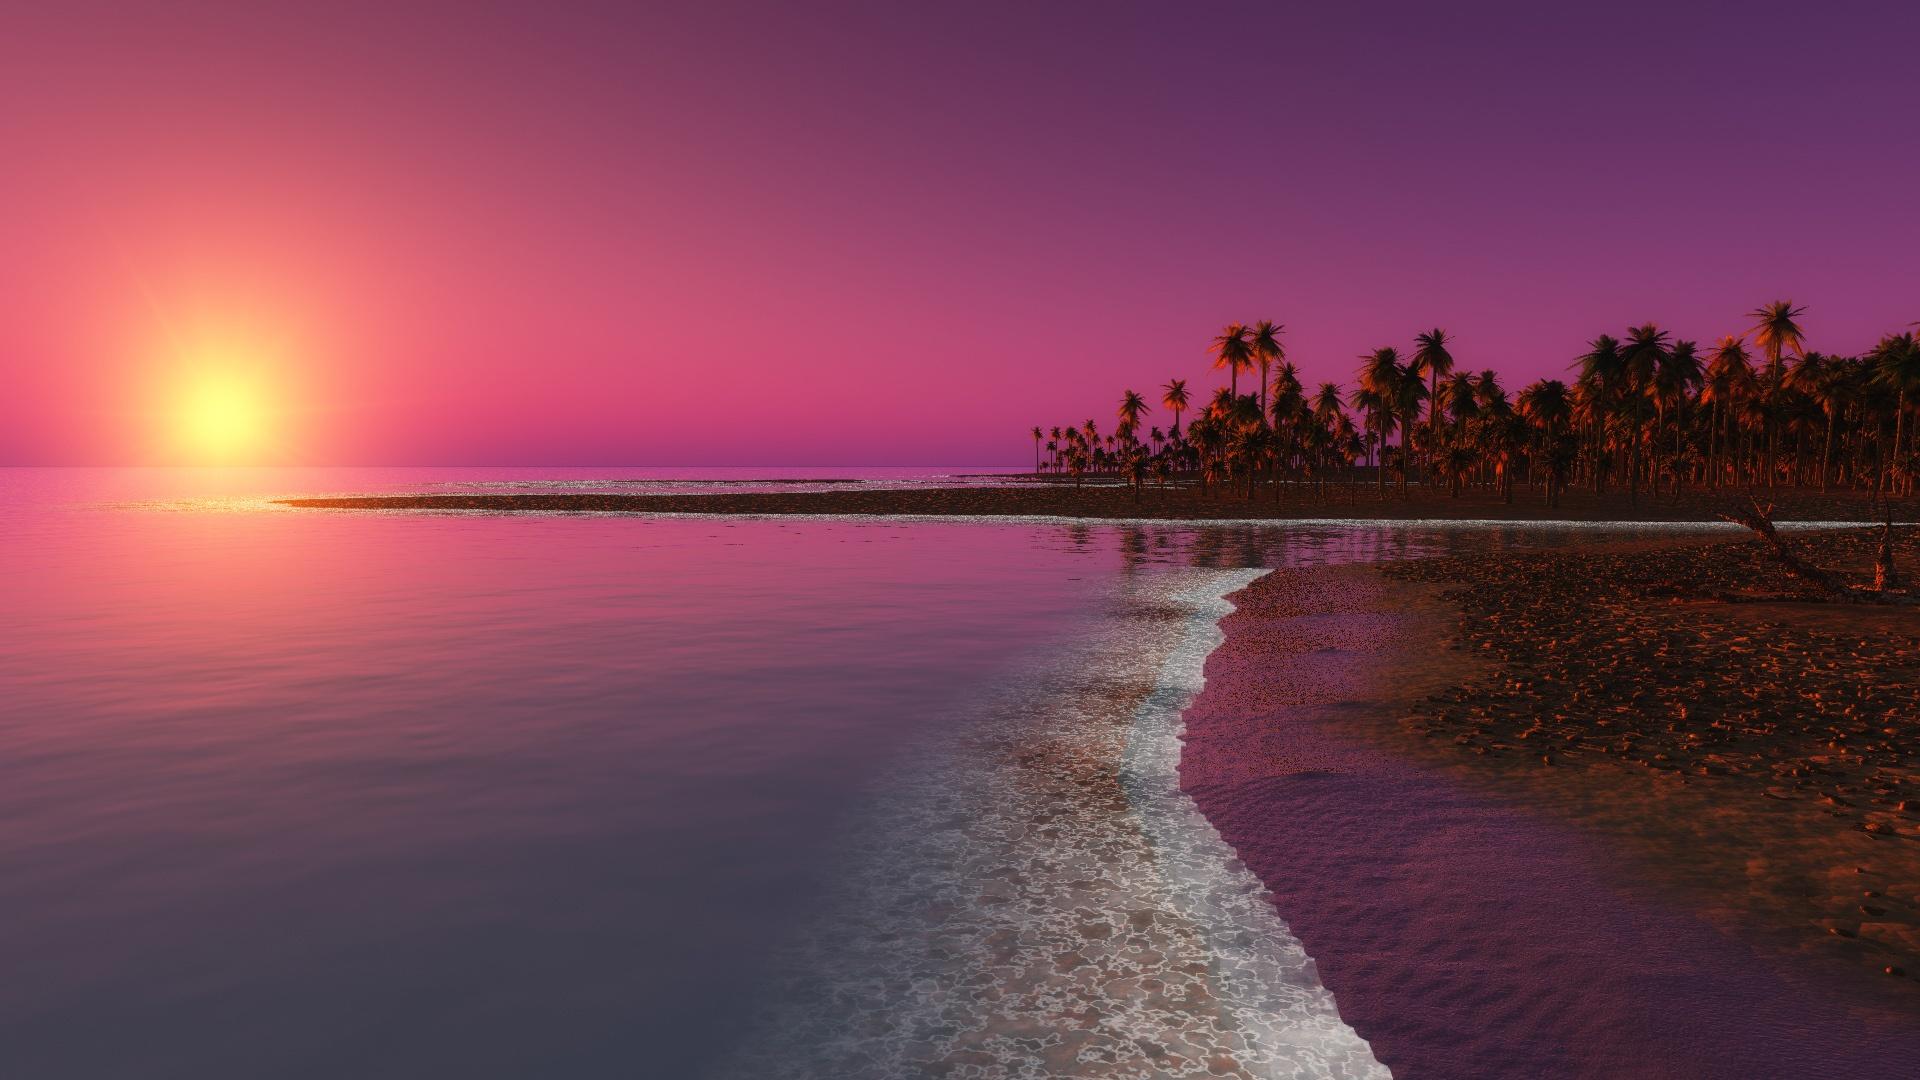 Twilight Sunset 4156323 1920x1200 All For Desktop 1920x1080